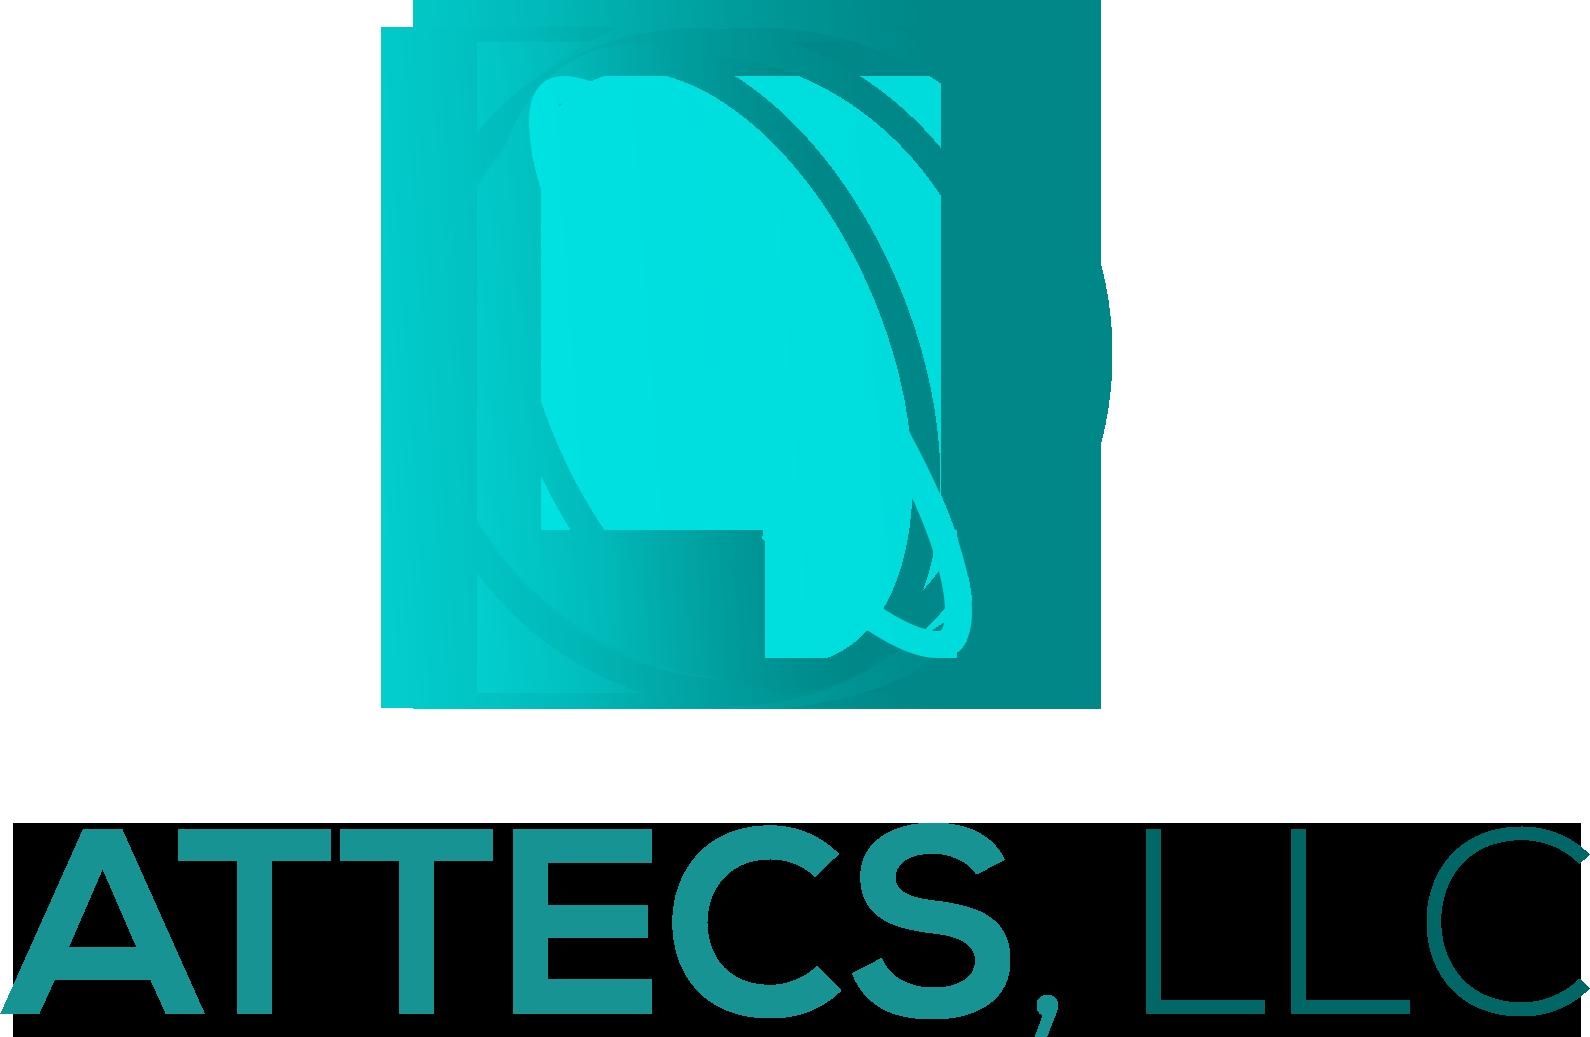 ATTECS Logo